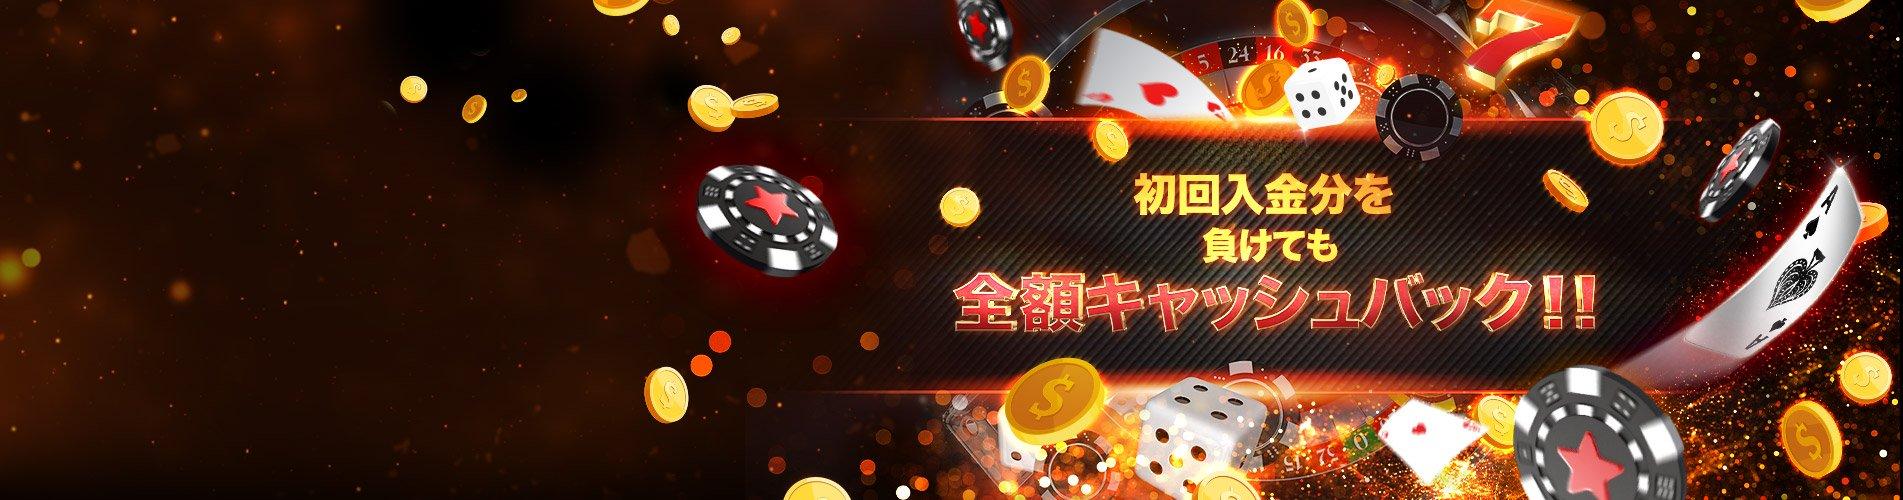 Bitstarz Casino Images01 - CasinoTop